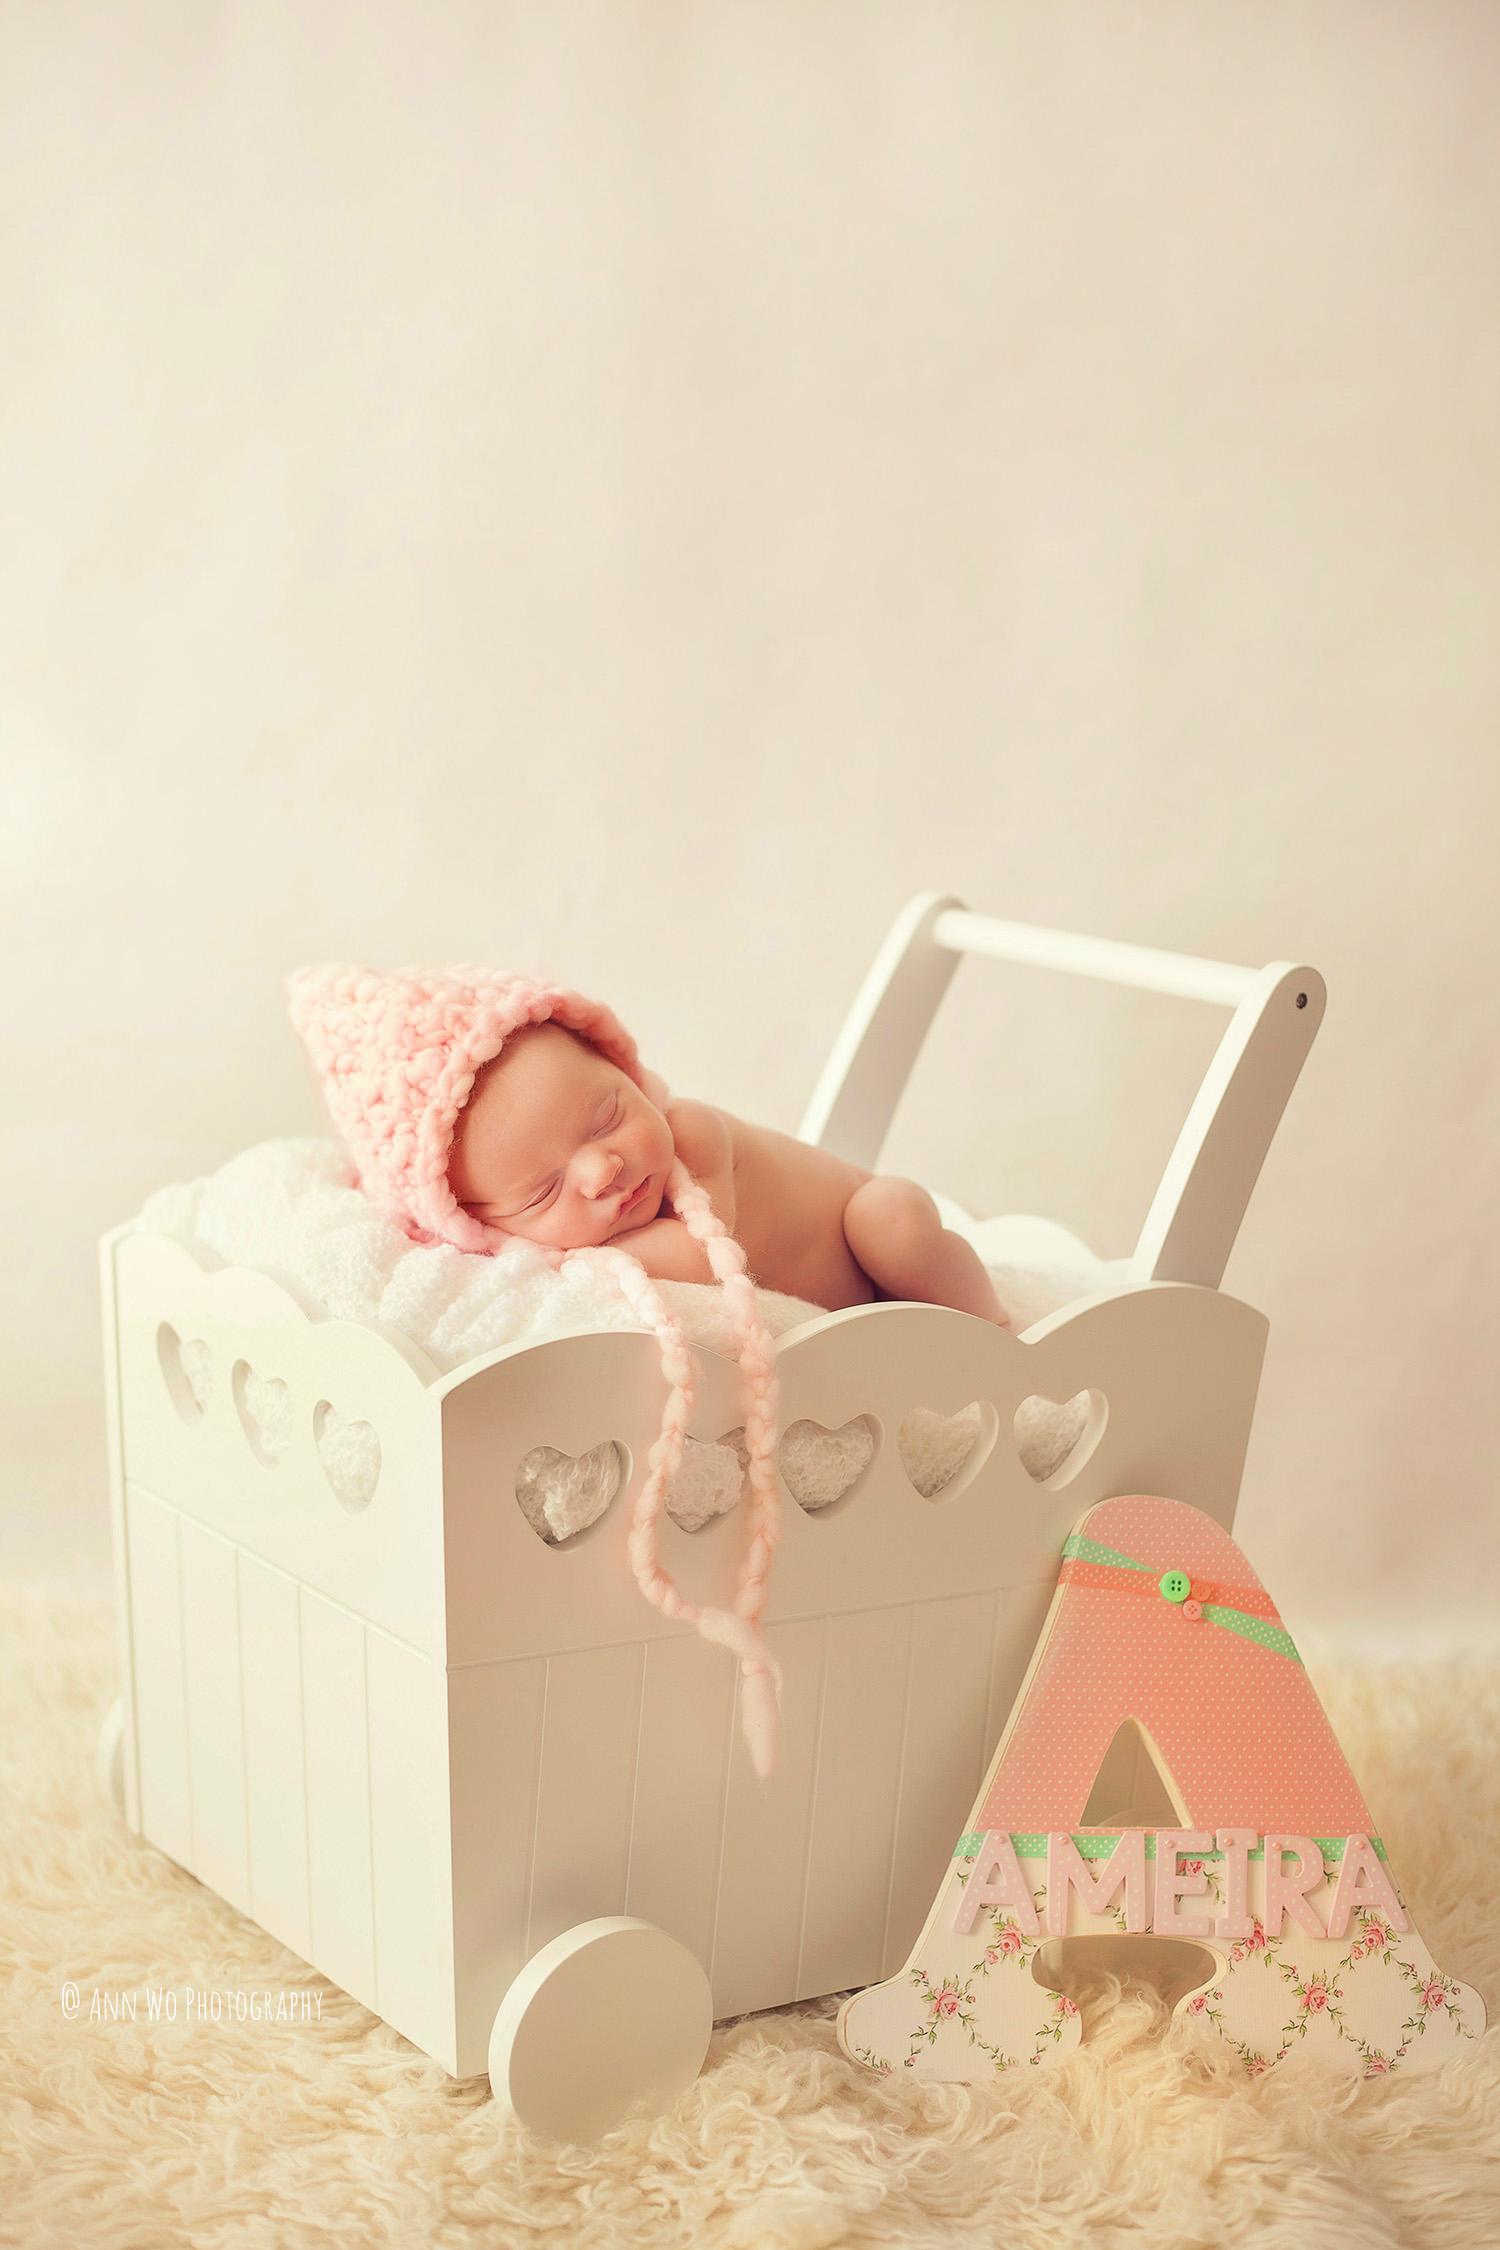 newborn-photographer-west-london-home-session-ann-wo12.jpg